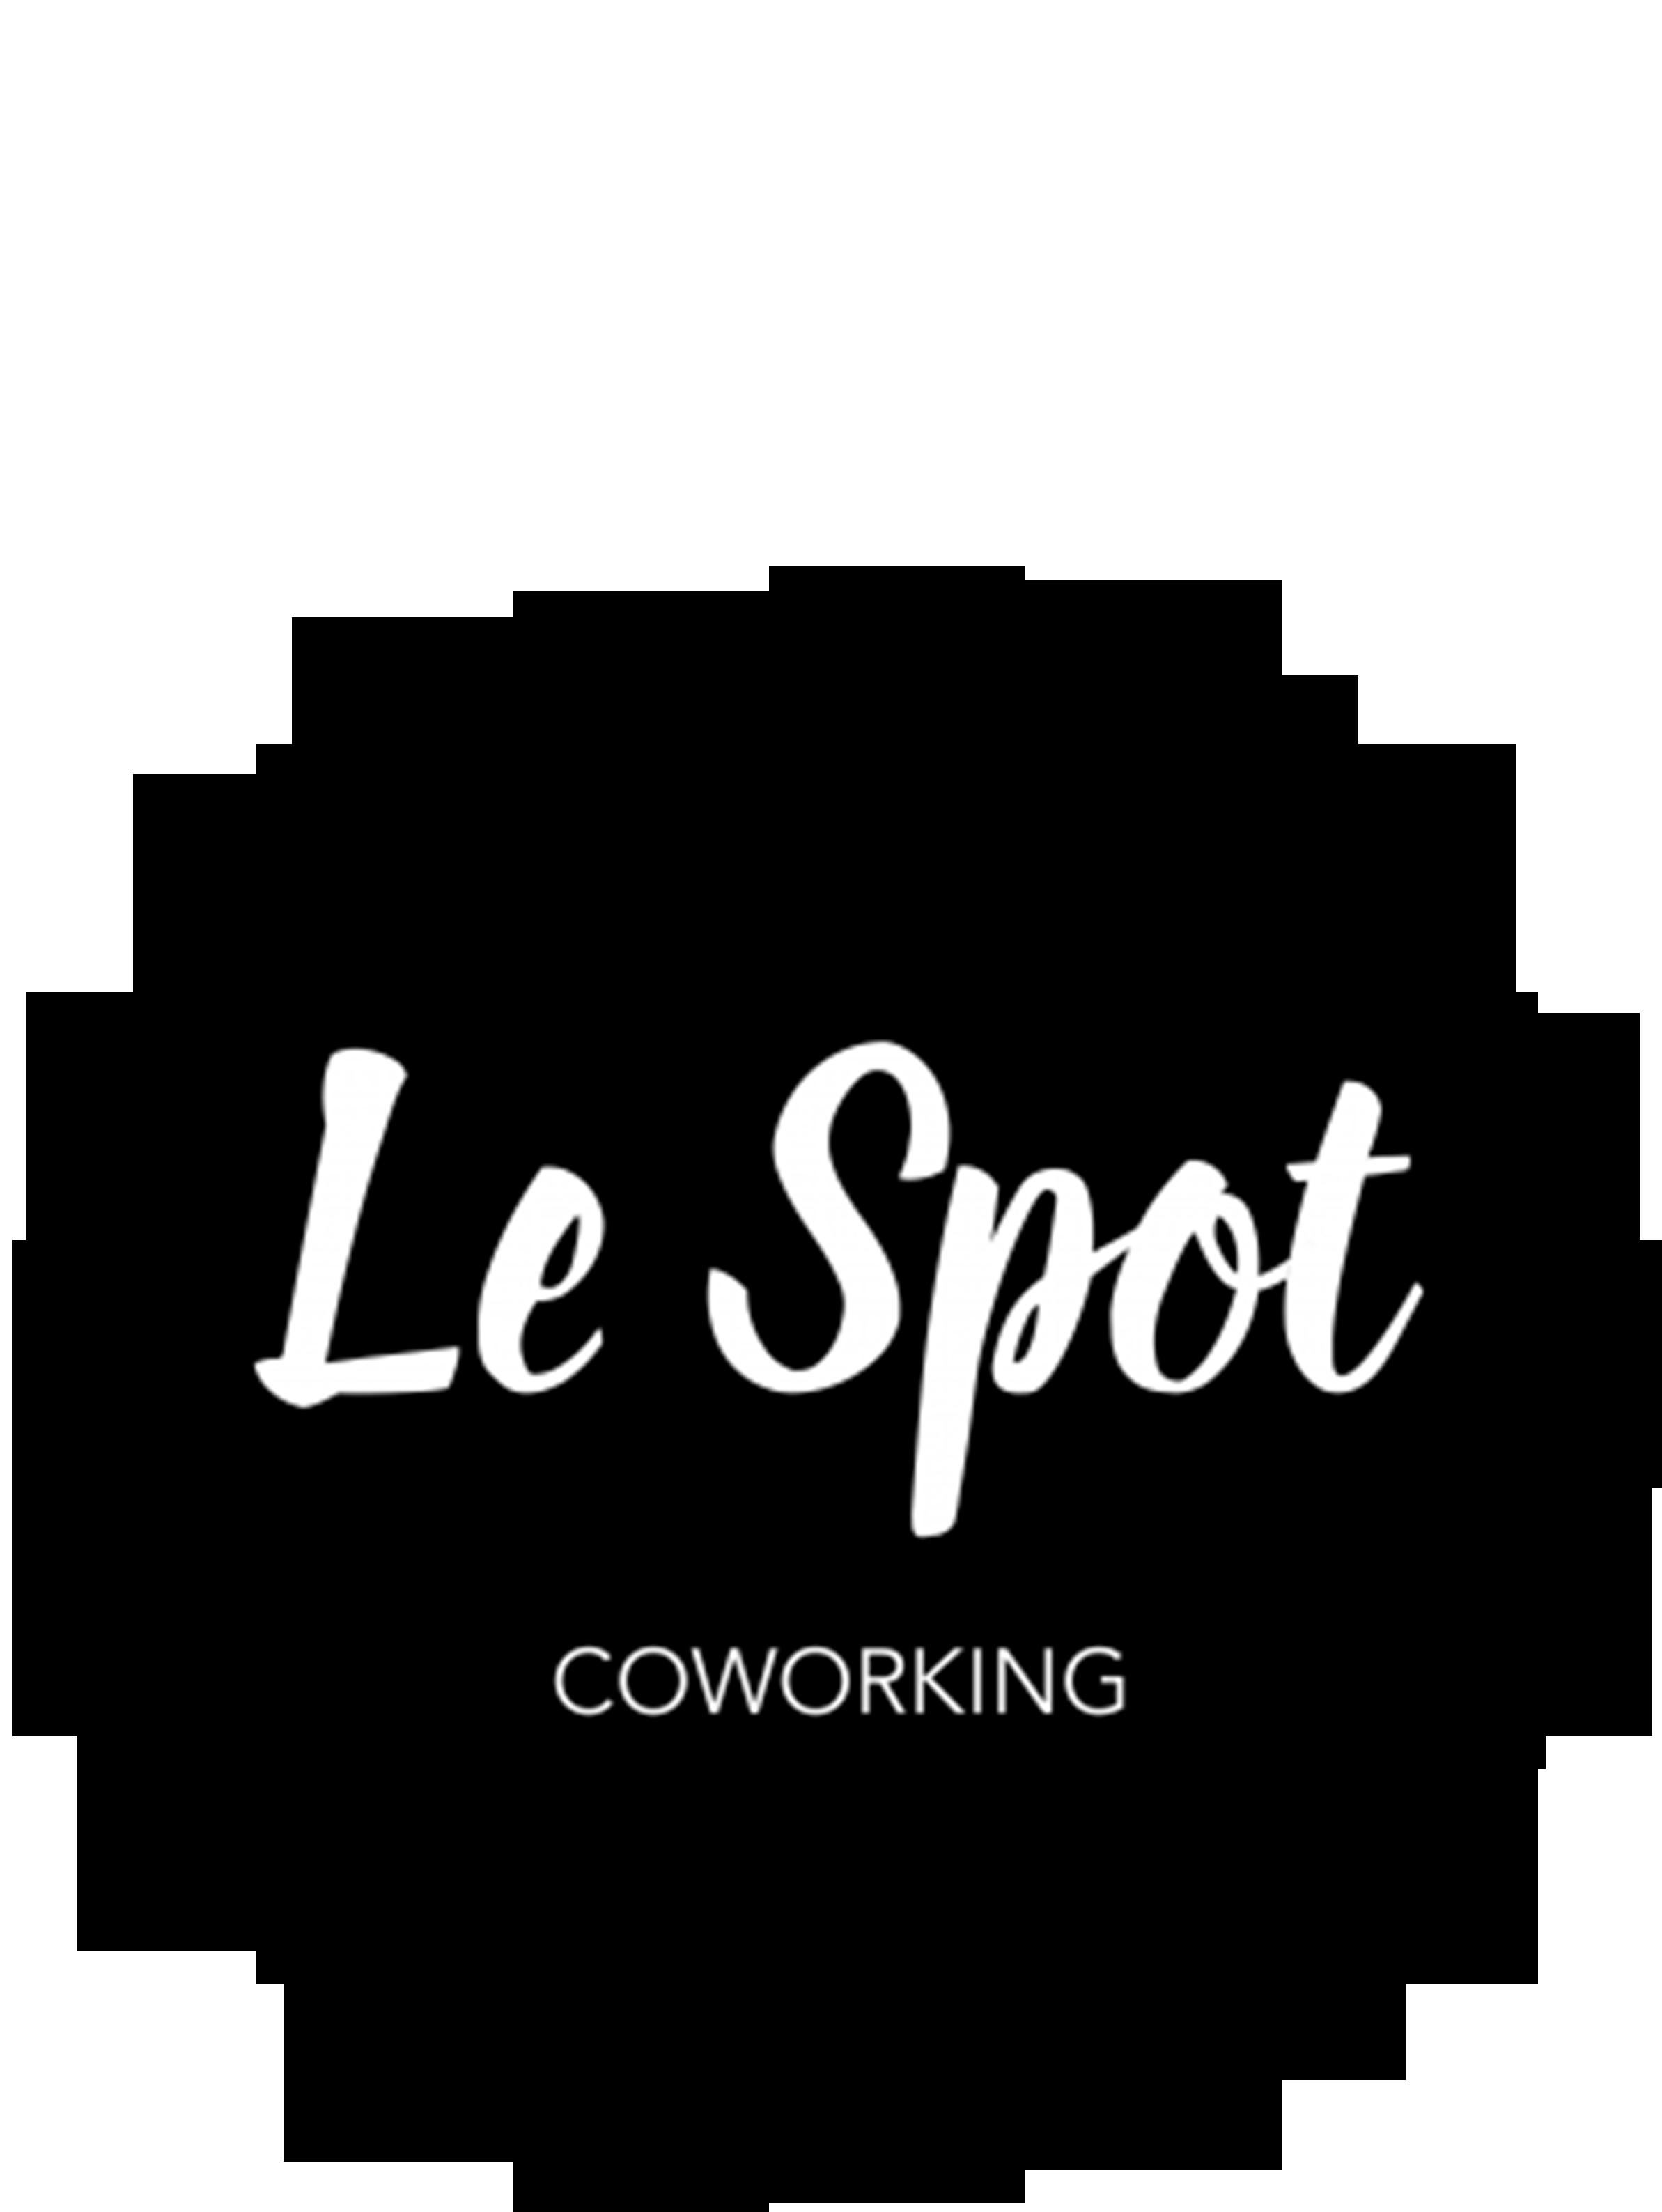 Le Spot - Coworking